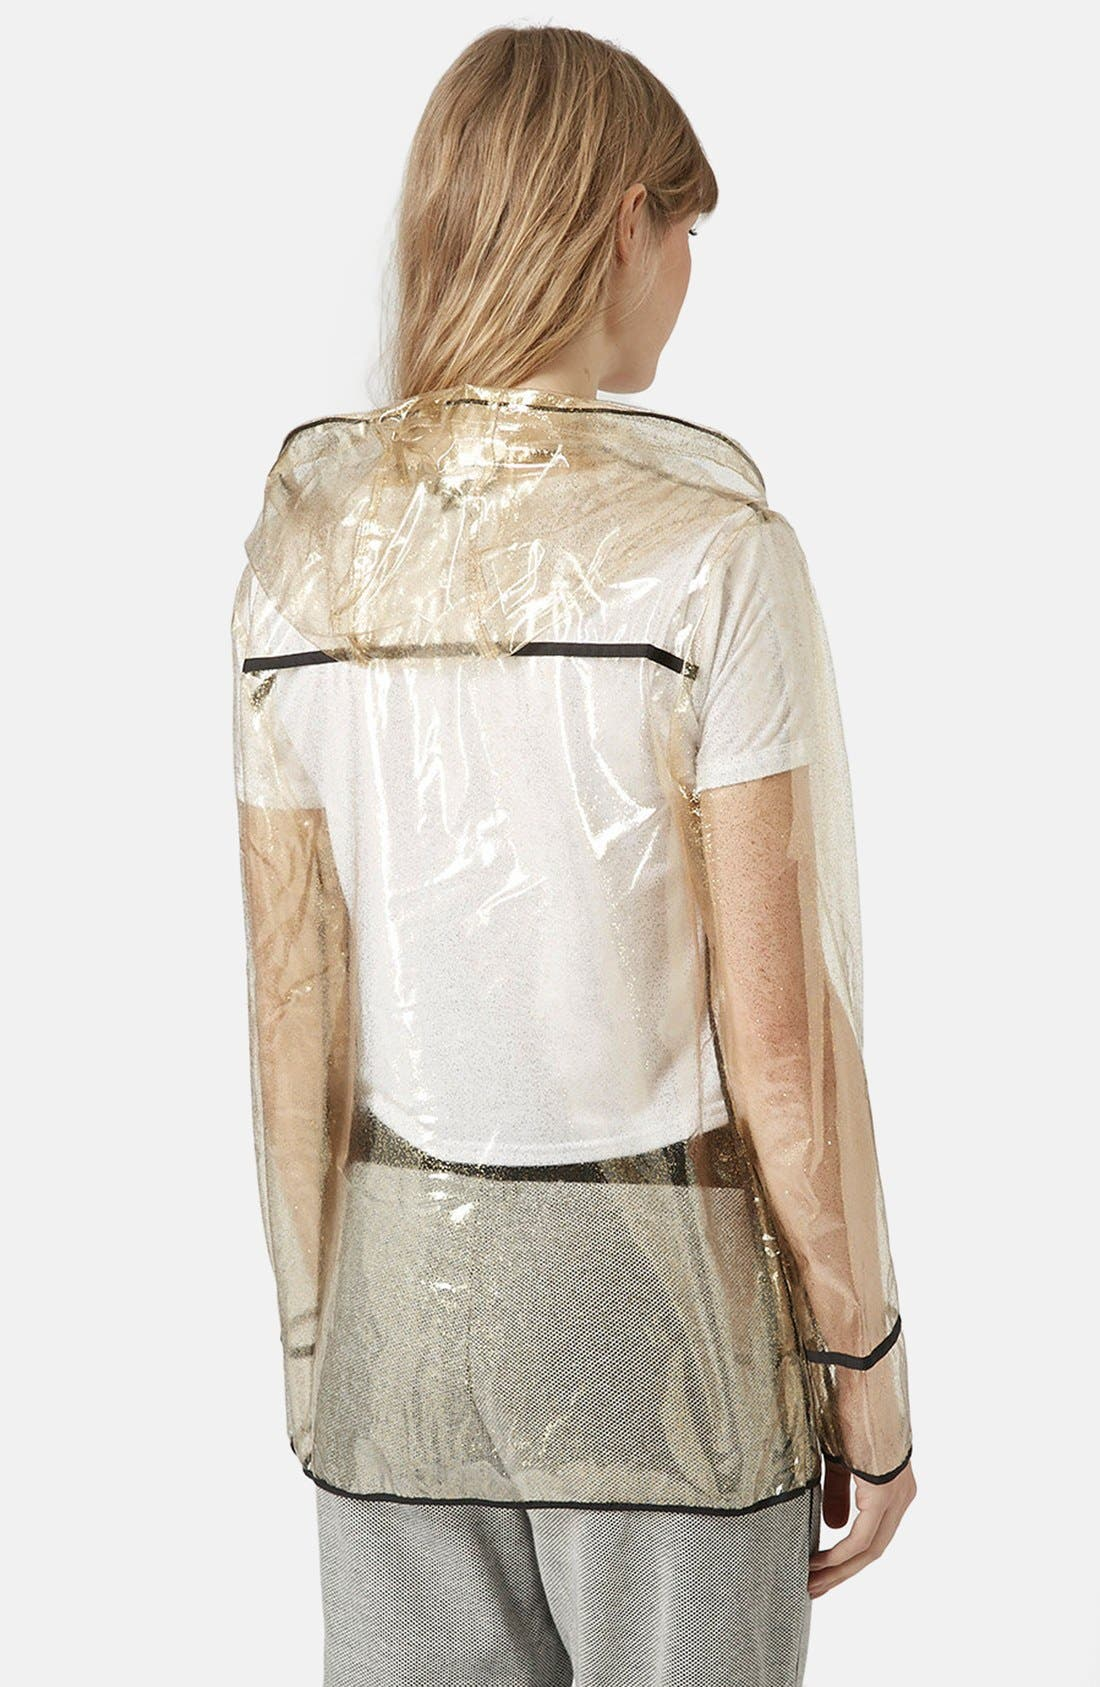 Gold Glitter Transparent Plastic Rain Jacket,                             Alternate thumbnail 4, color,                             710